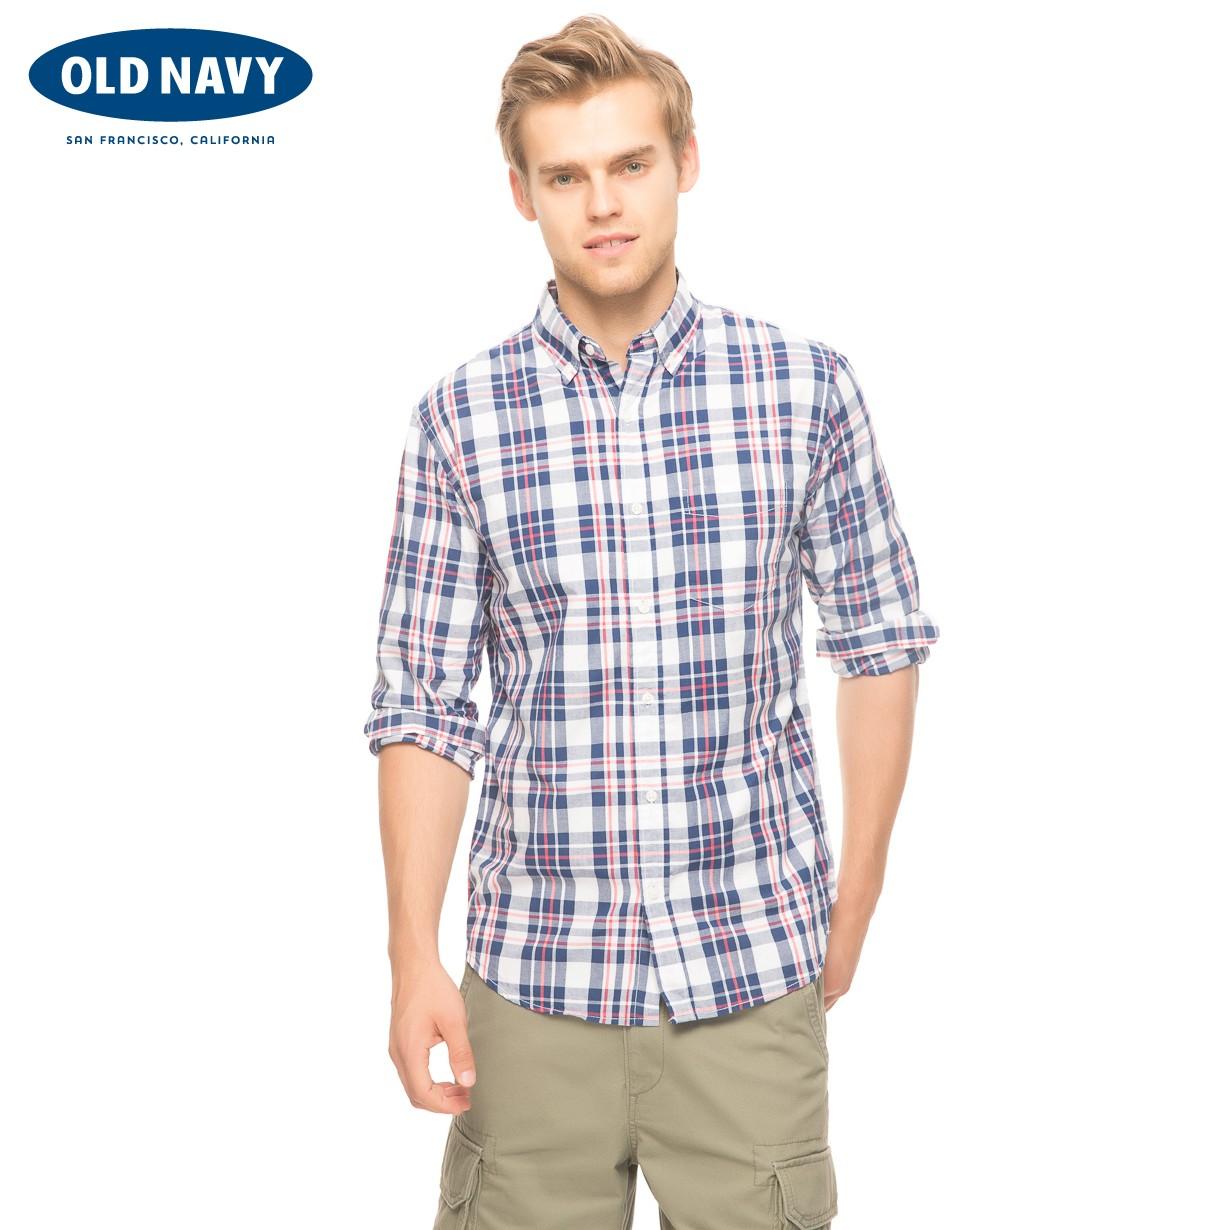 Рубашка мужская OLD NAVY 000438245 438245 рубашка мужская old navy 000438245 438245